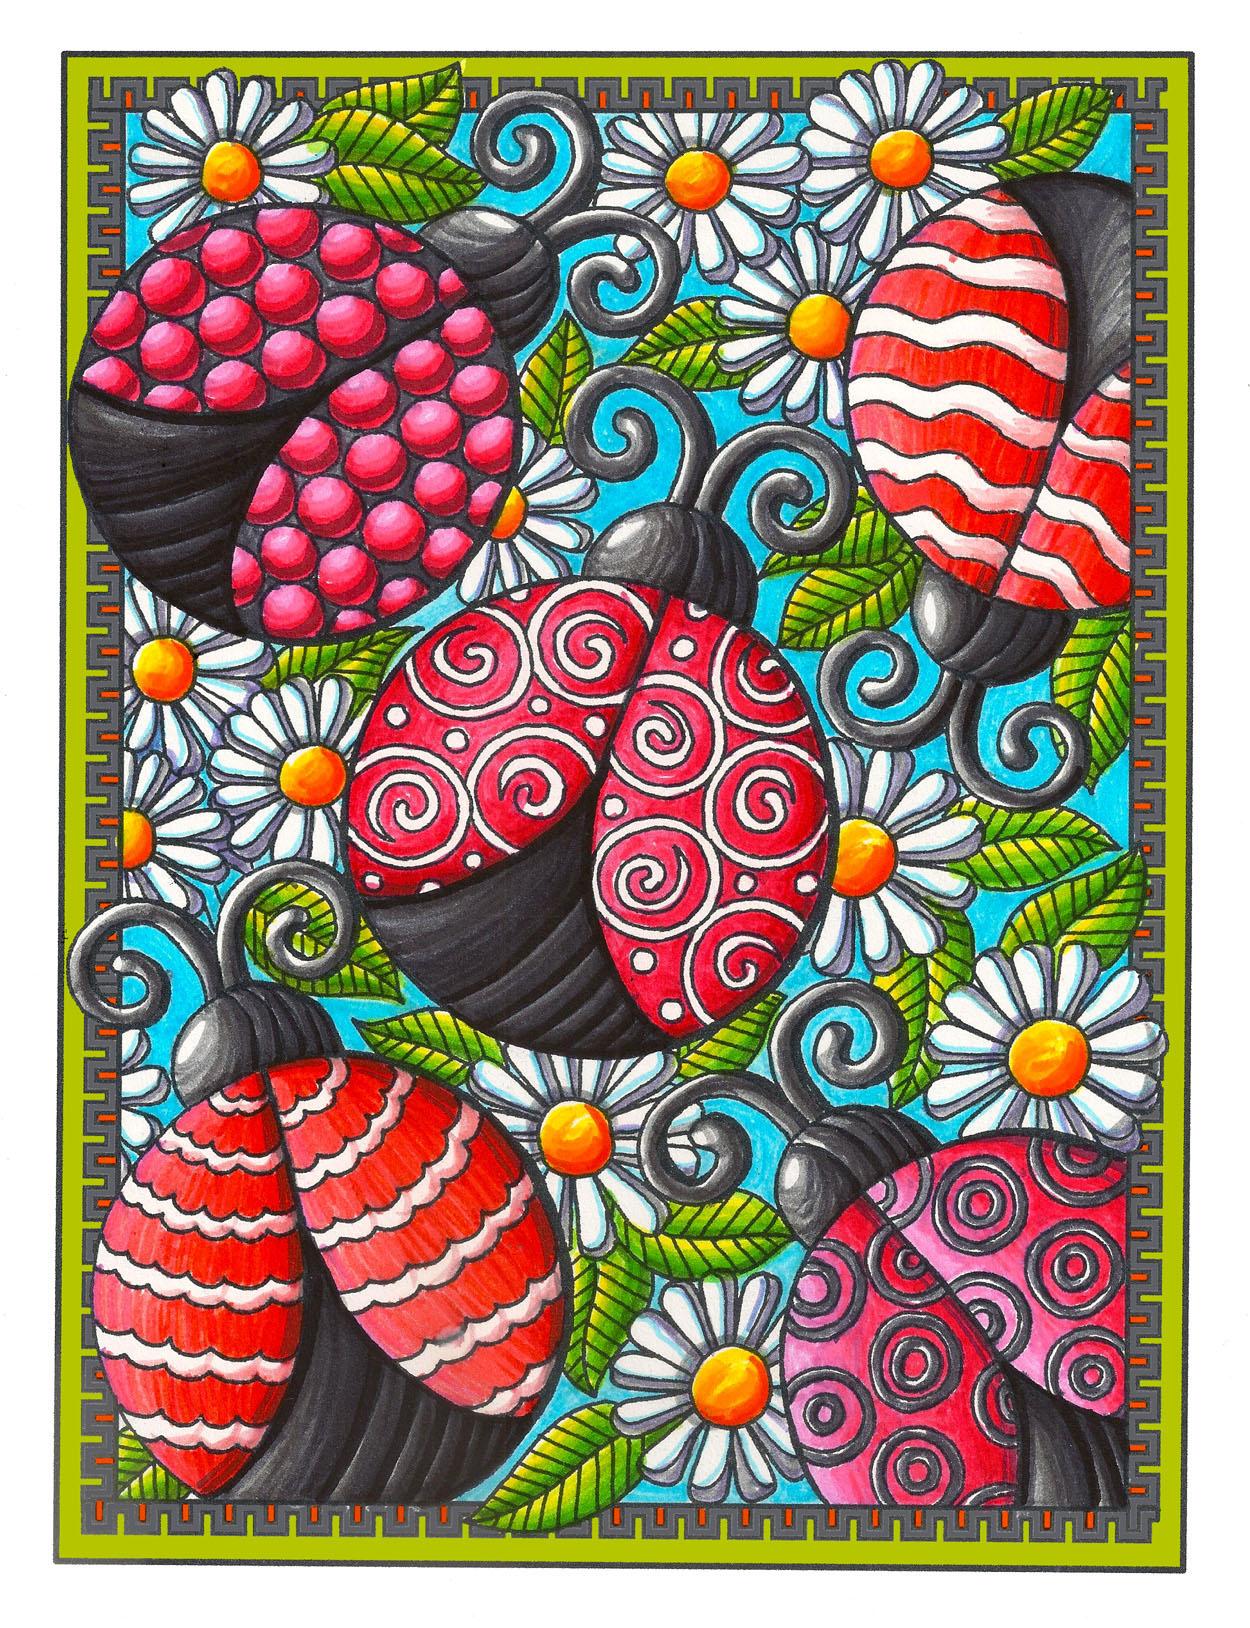 Ladybug Coloring Book Page